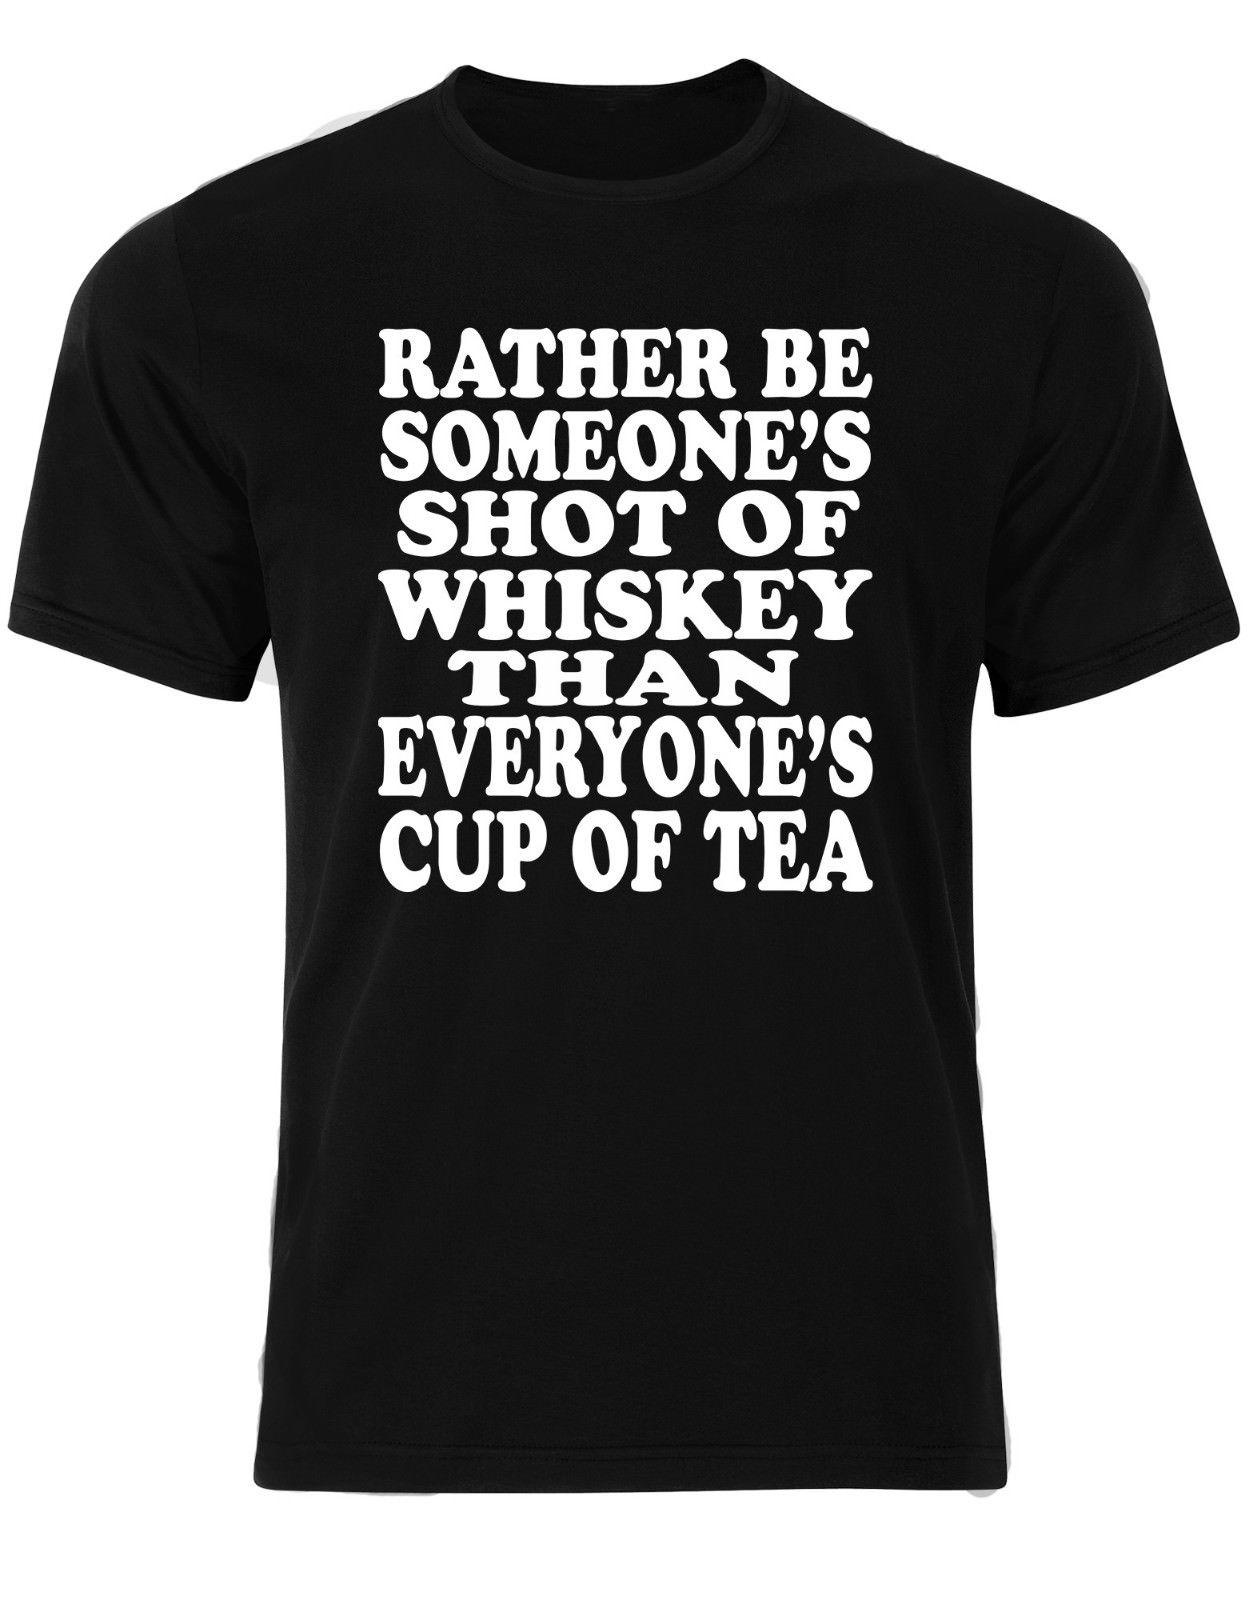 Gildan Rather Be Someones Shot OF Whiskey Than Everyones Cup Of Tea Men T-shirt AM65